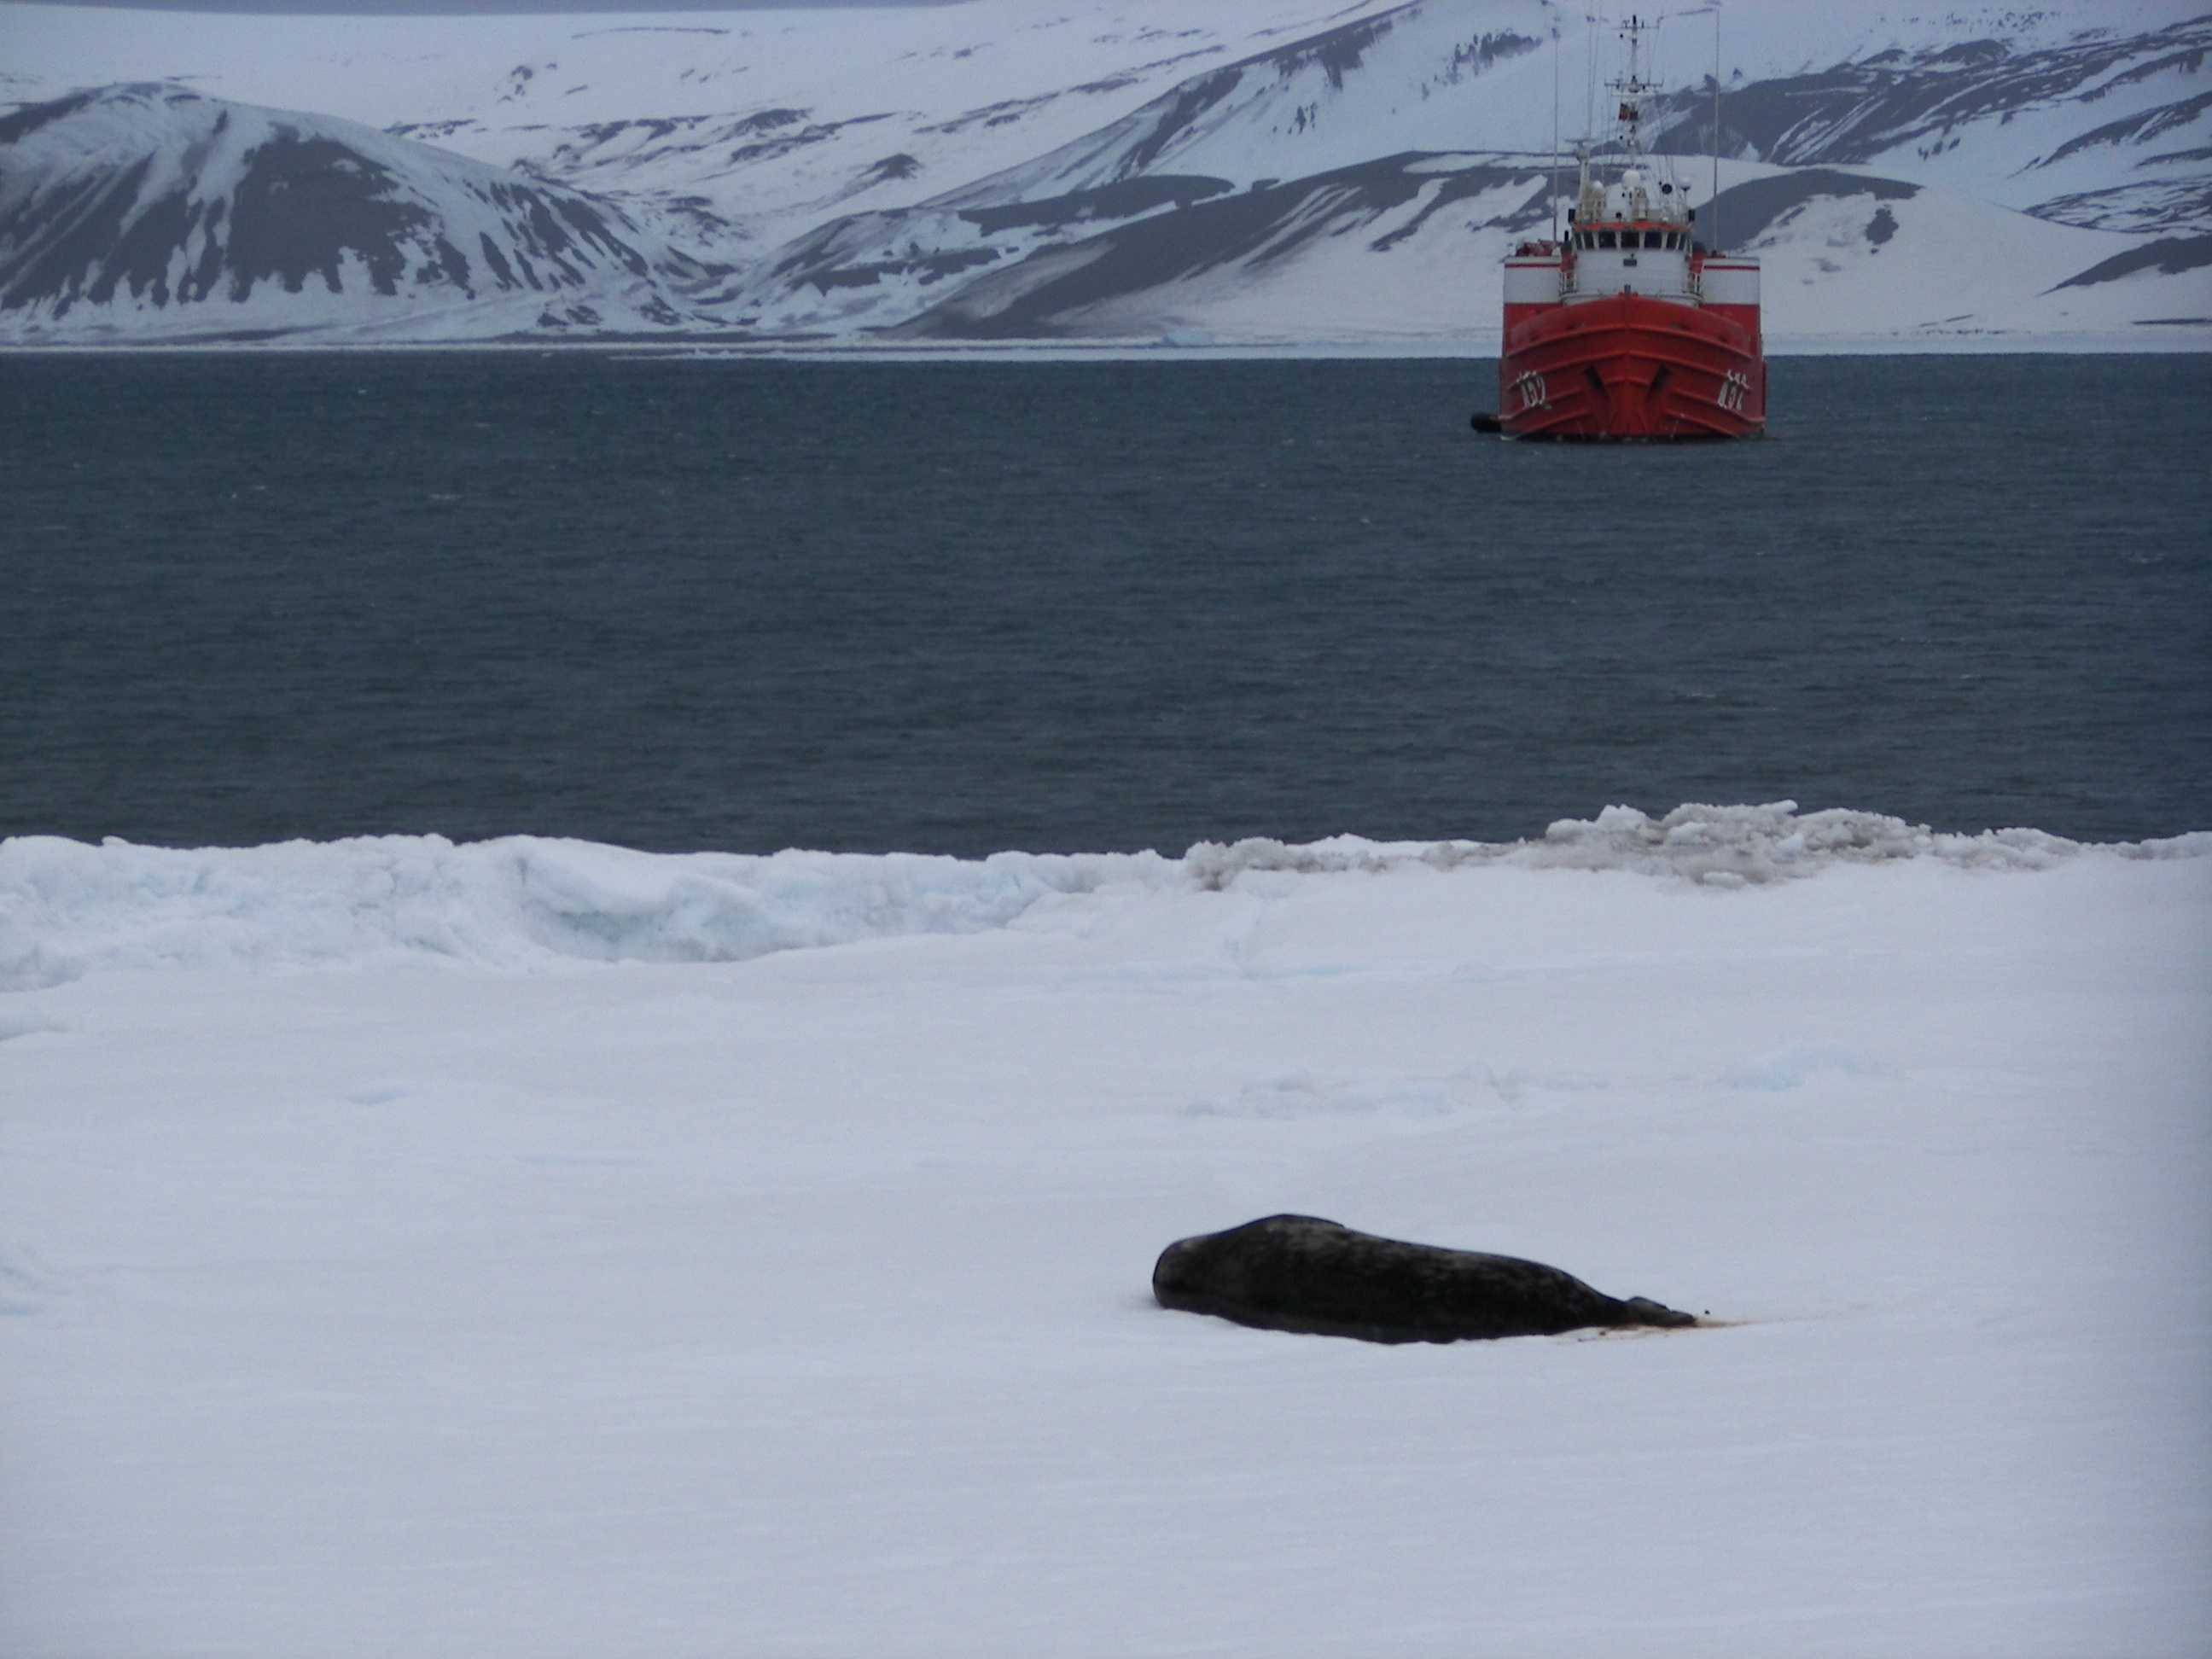 Foca antartica